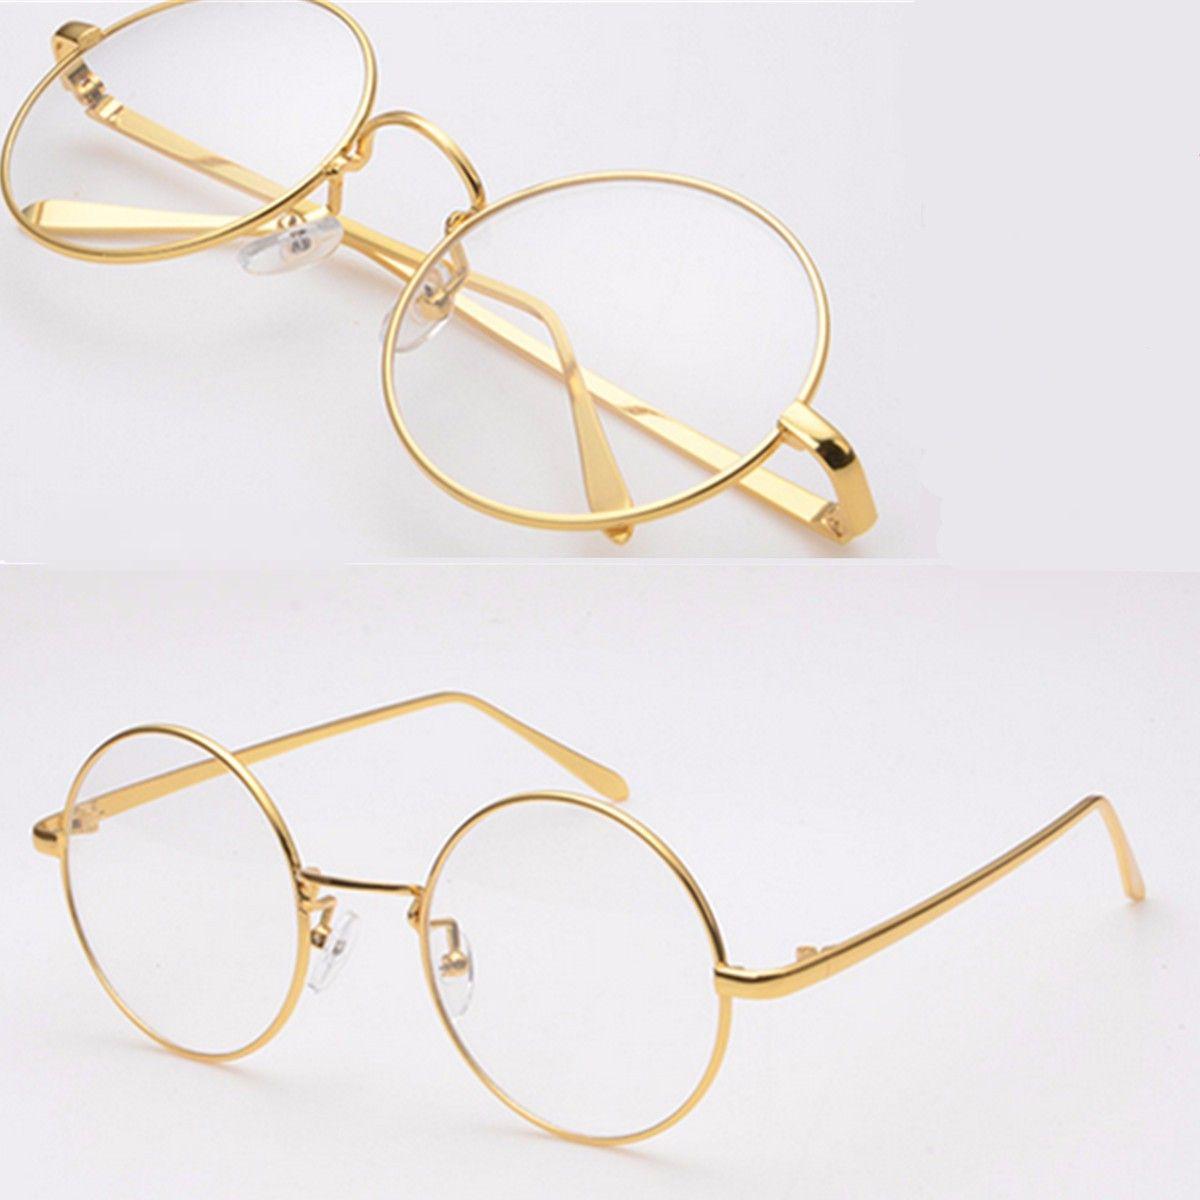 gold metal vintage round eyeglass frame clear lens full